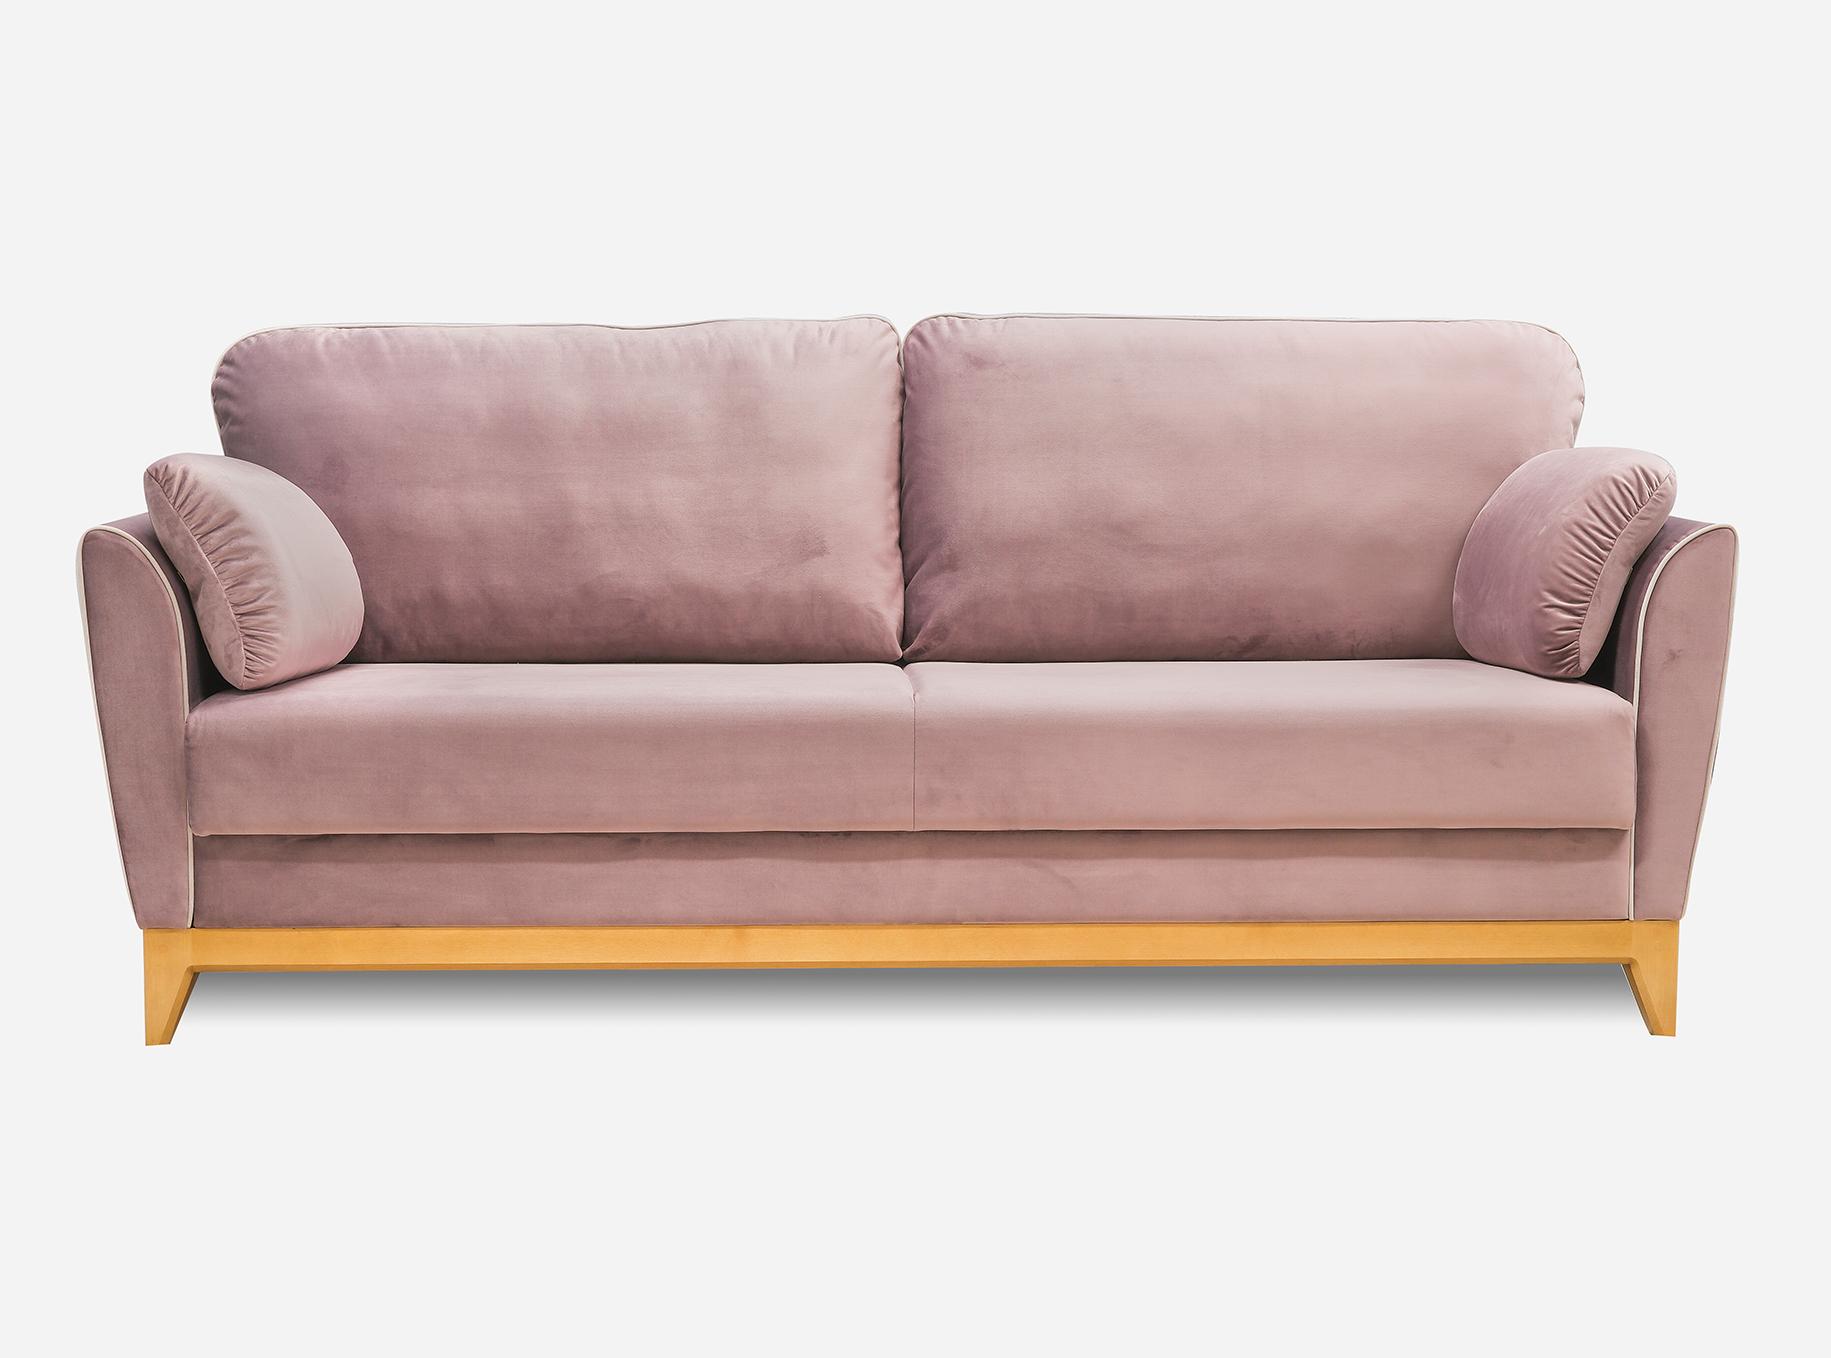 Диван-кровать Дива П1